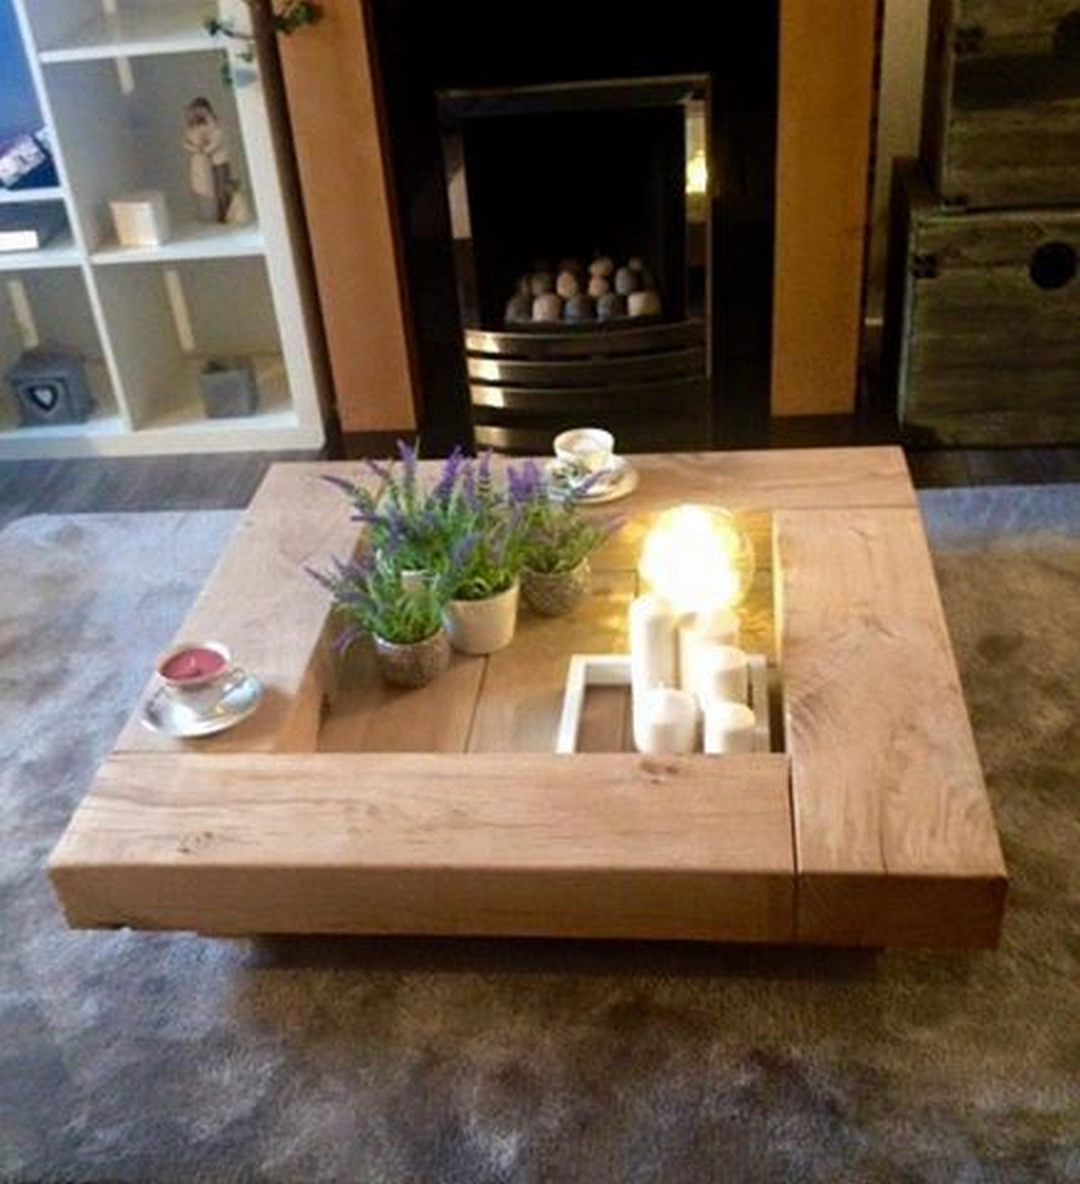 84 Wonderful Coffee Table Design Ideas | Furniture Design ...